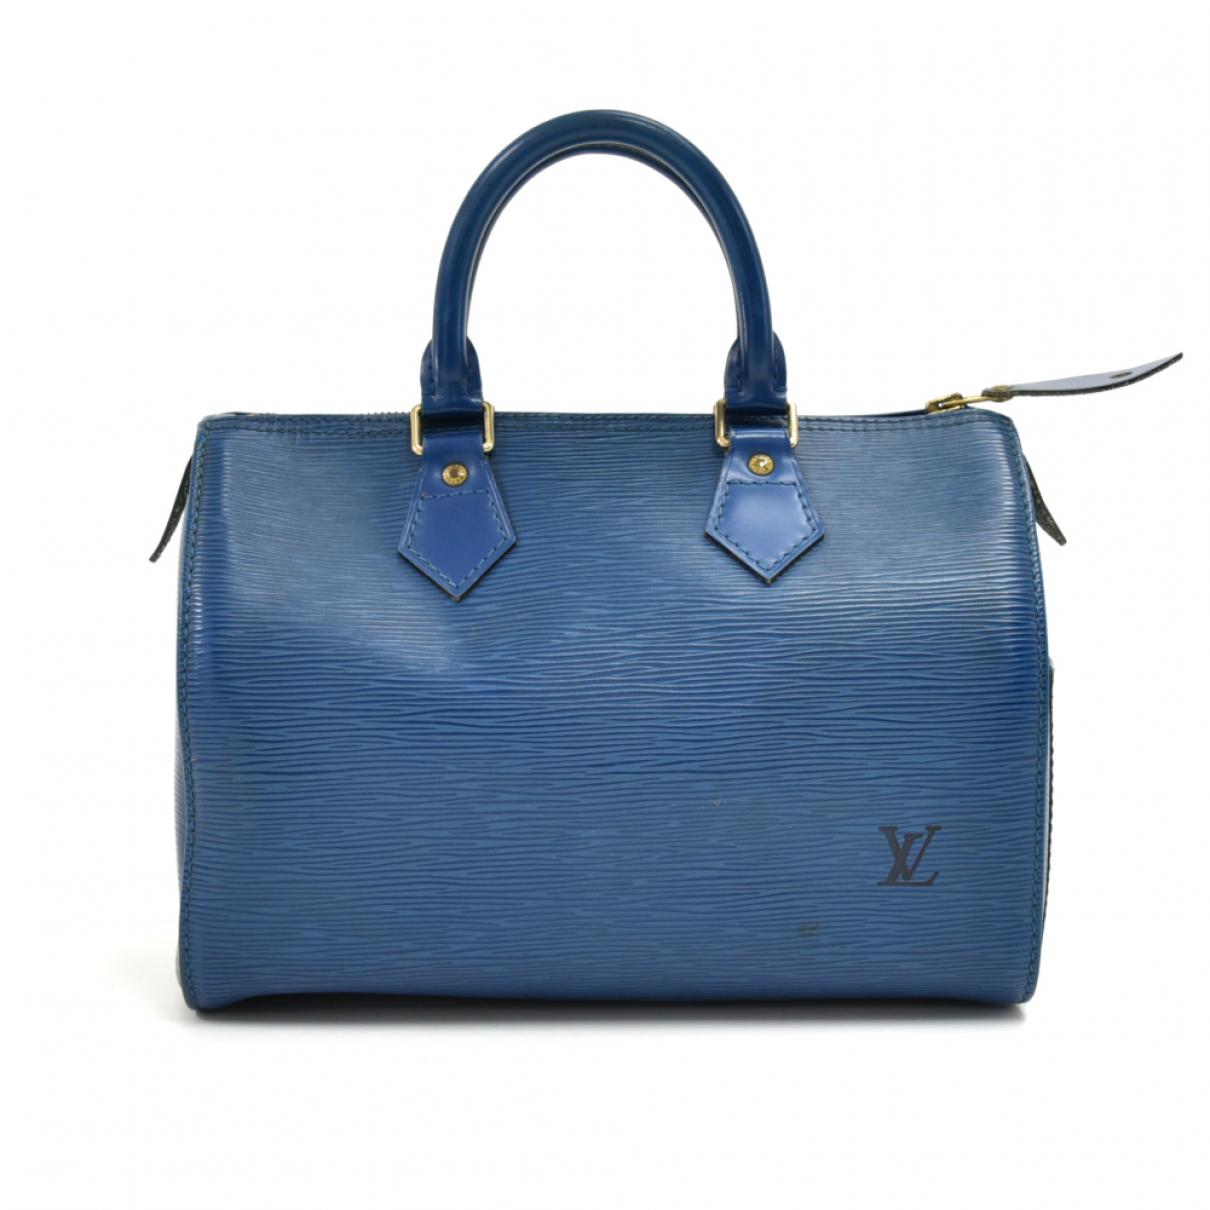 Louis Vuitton Speedy Blue Leather handbag for Women N